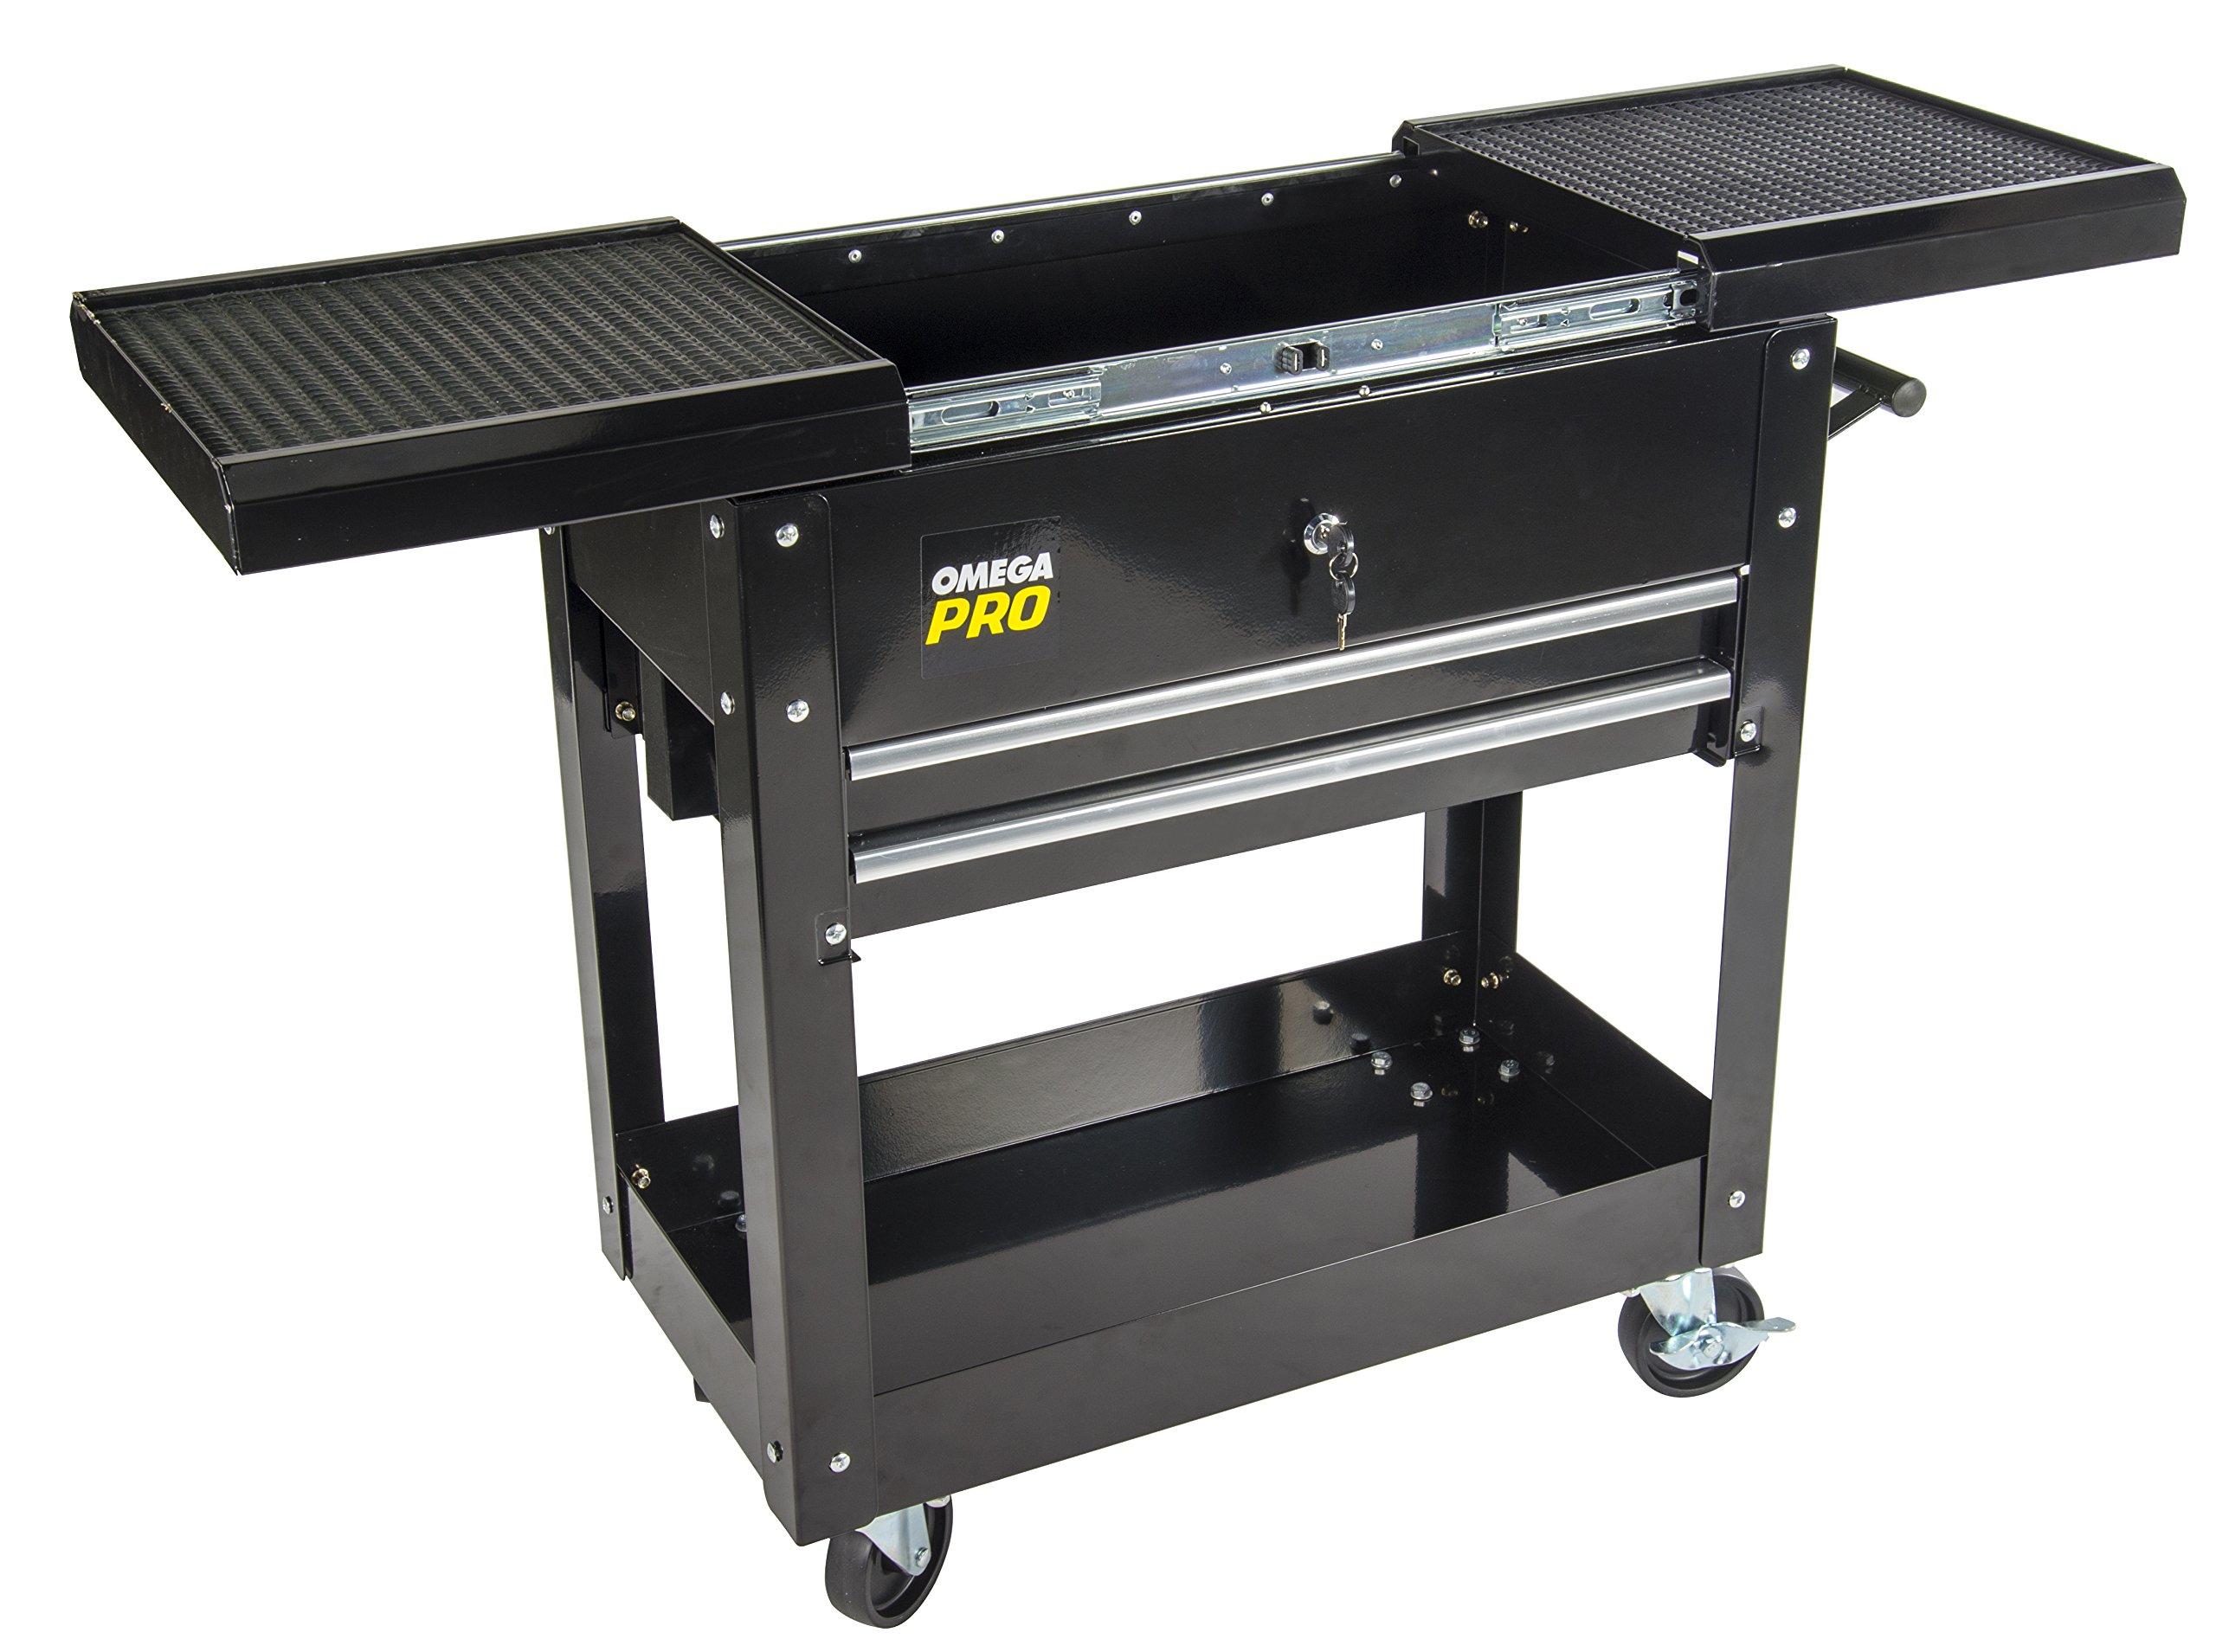 Omega Pro 97431 Omega Pro Heavy Duty Tool Cart, 17.32'' Height, 16.74'' Width, 31.1'' Length